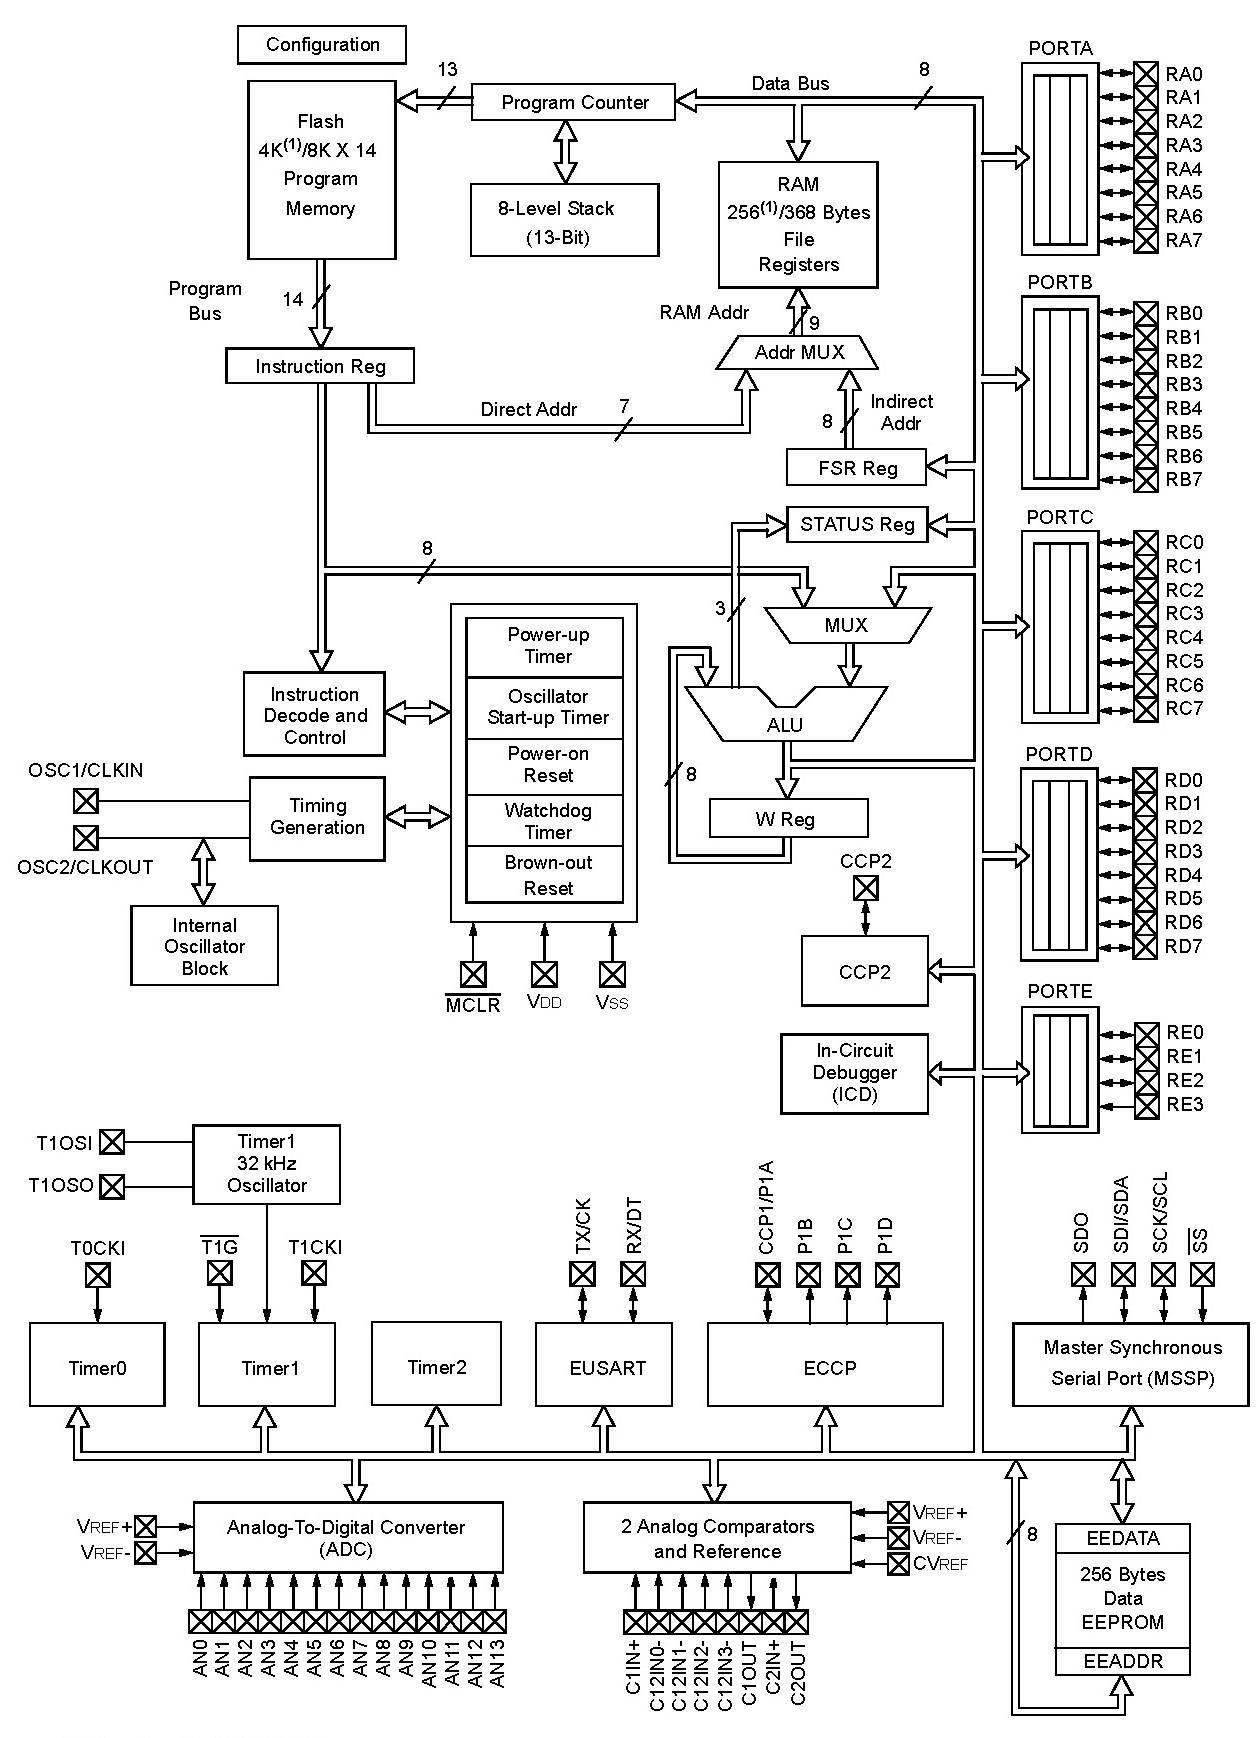 pic16f887 microcontroller pinout  programming